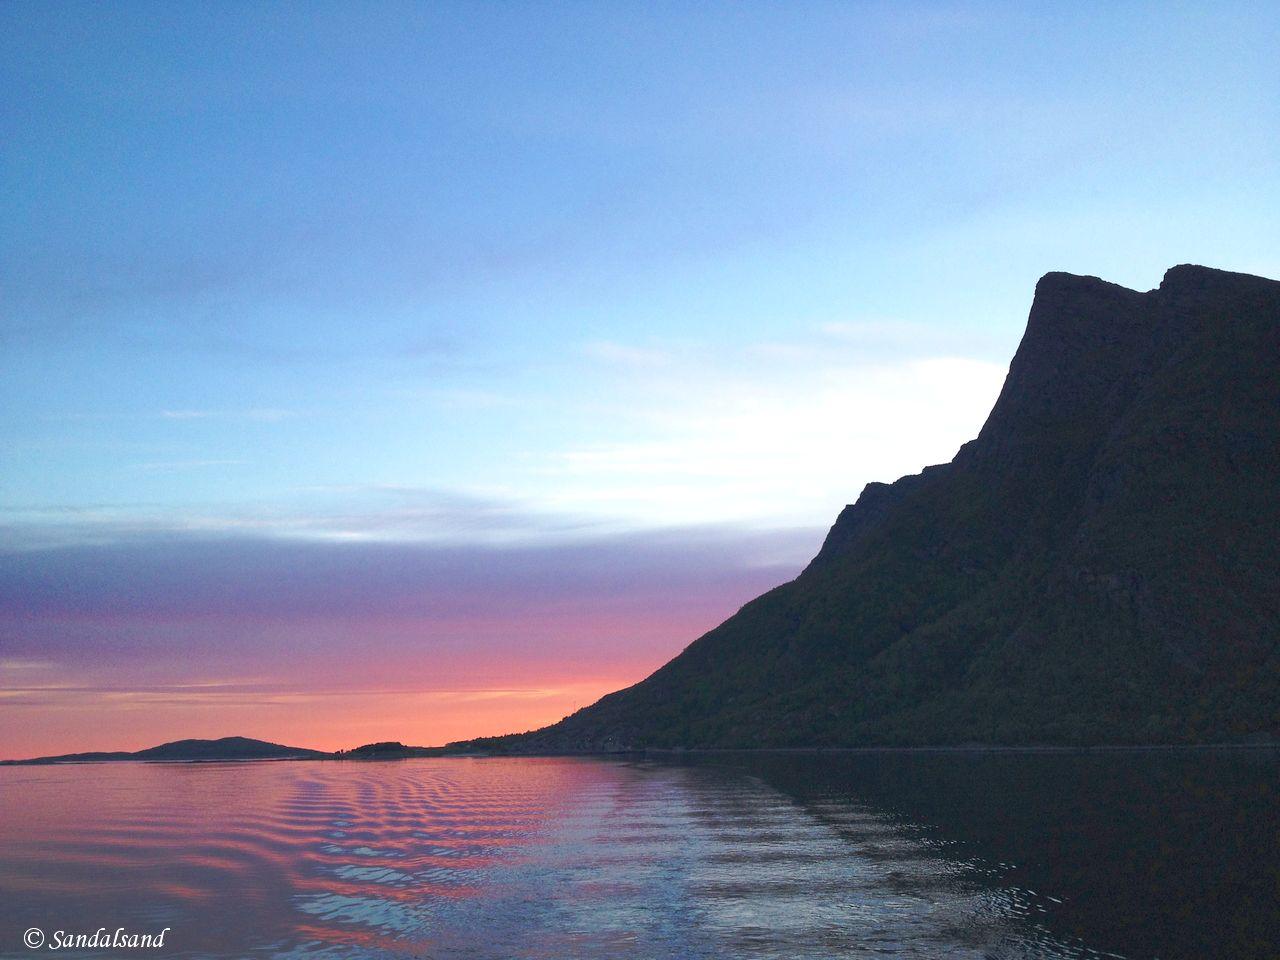 Norway - Nordland - Leaving Kjerringøy